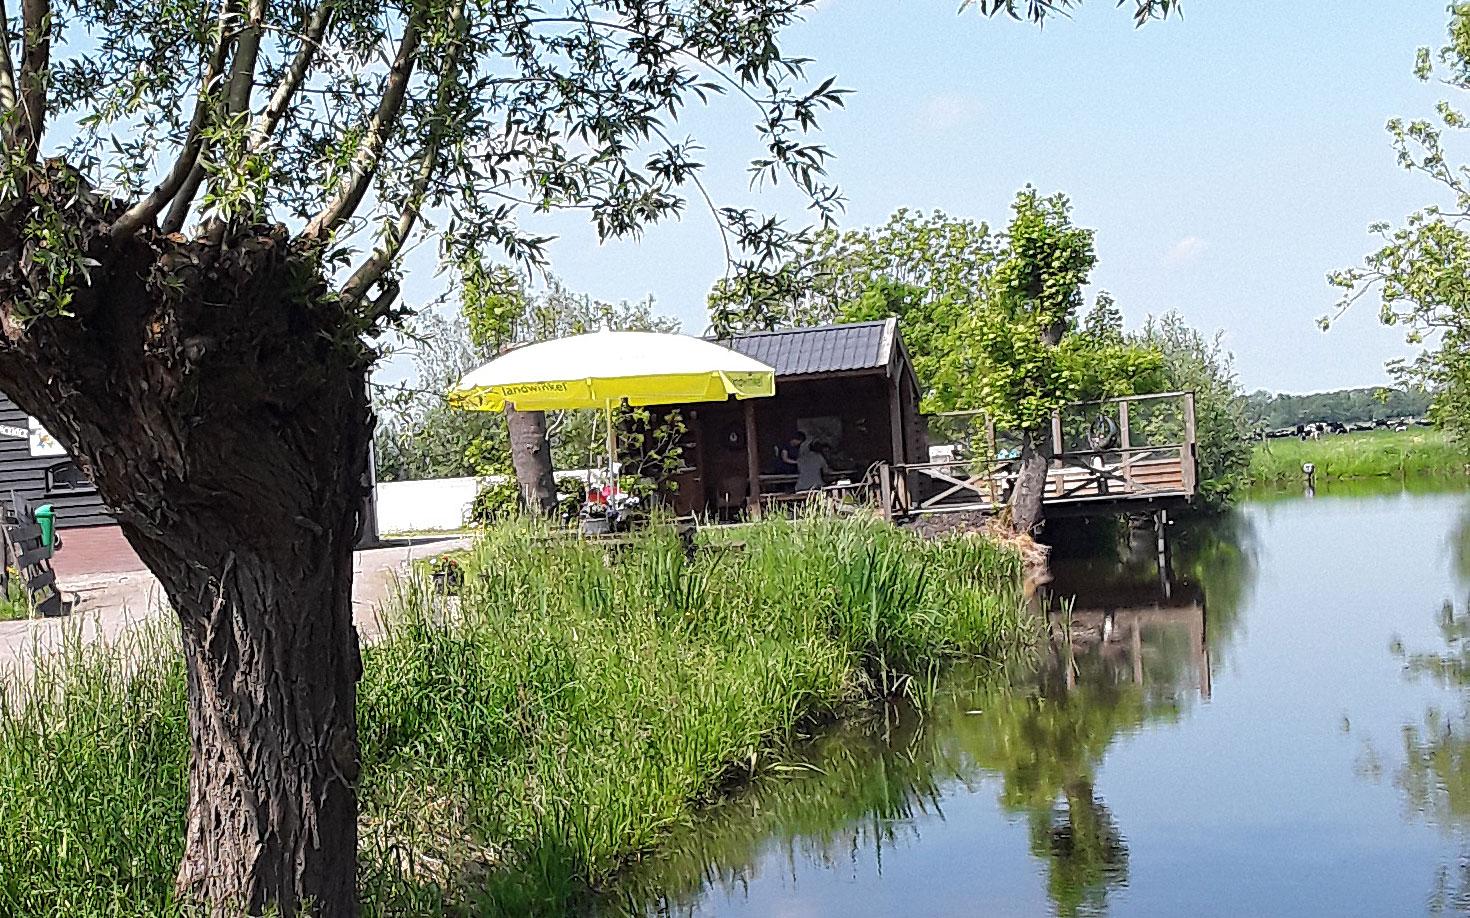 picknick rustwat wandelroute noordzijde landwinkel polsbroek